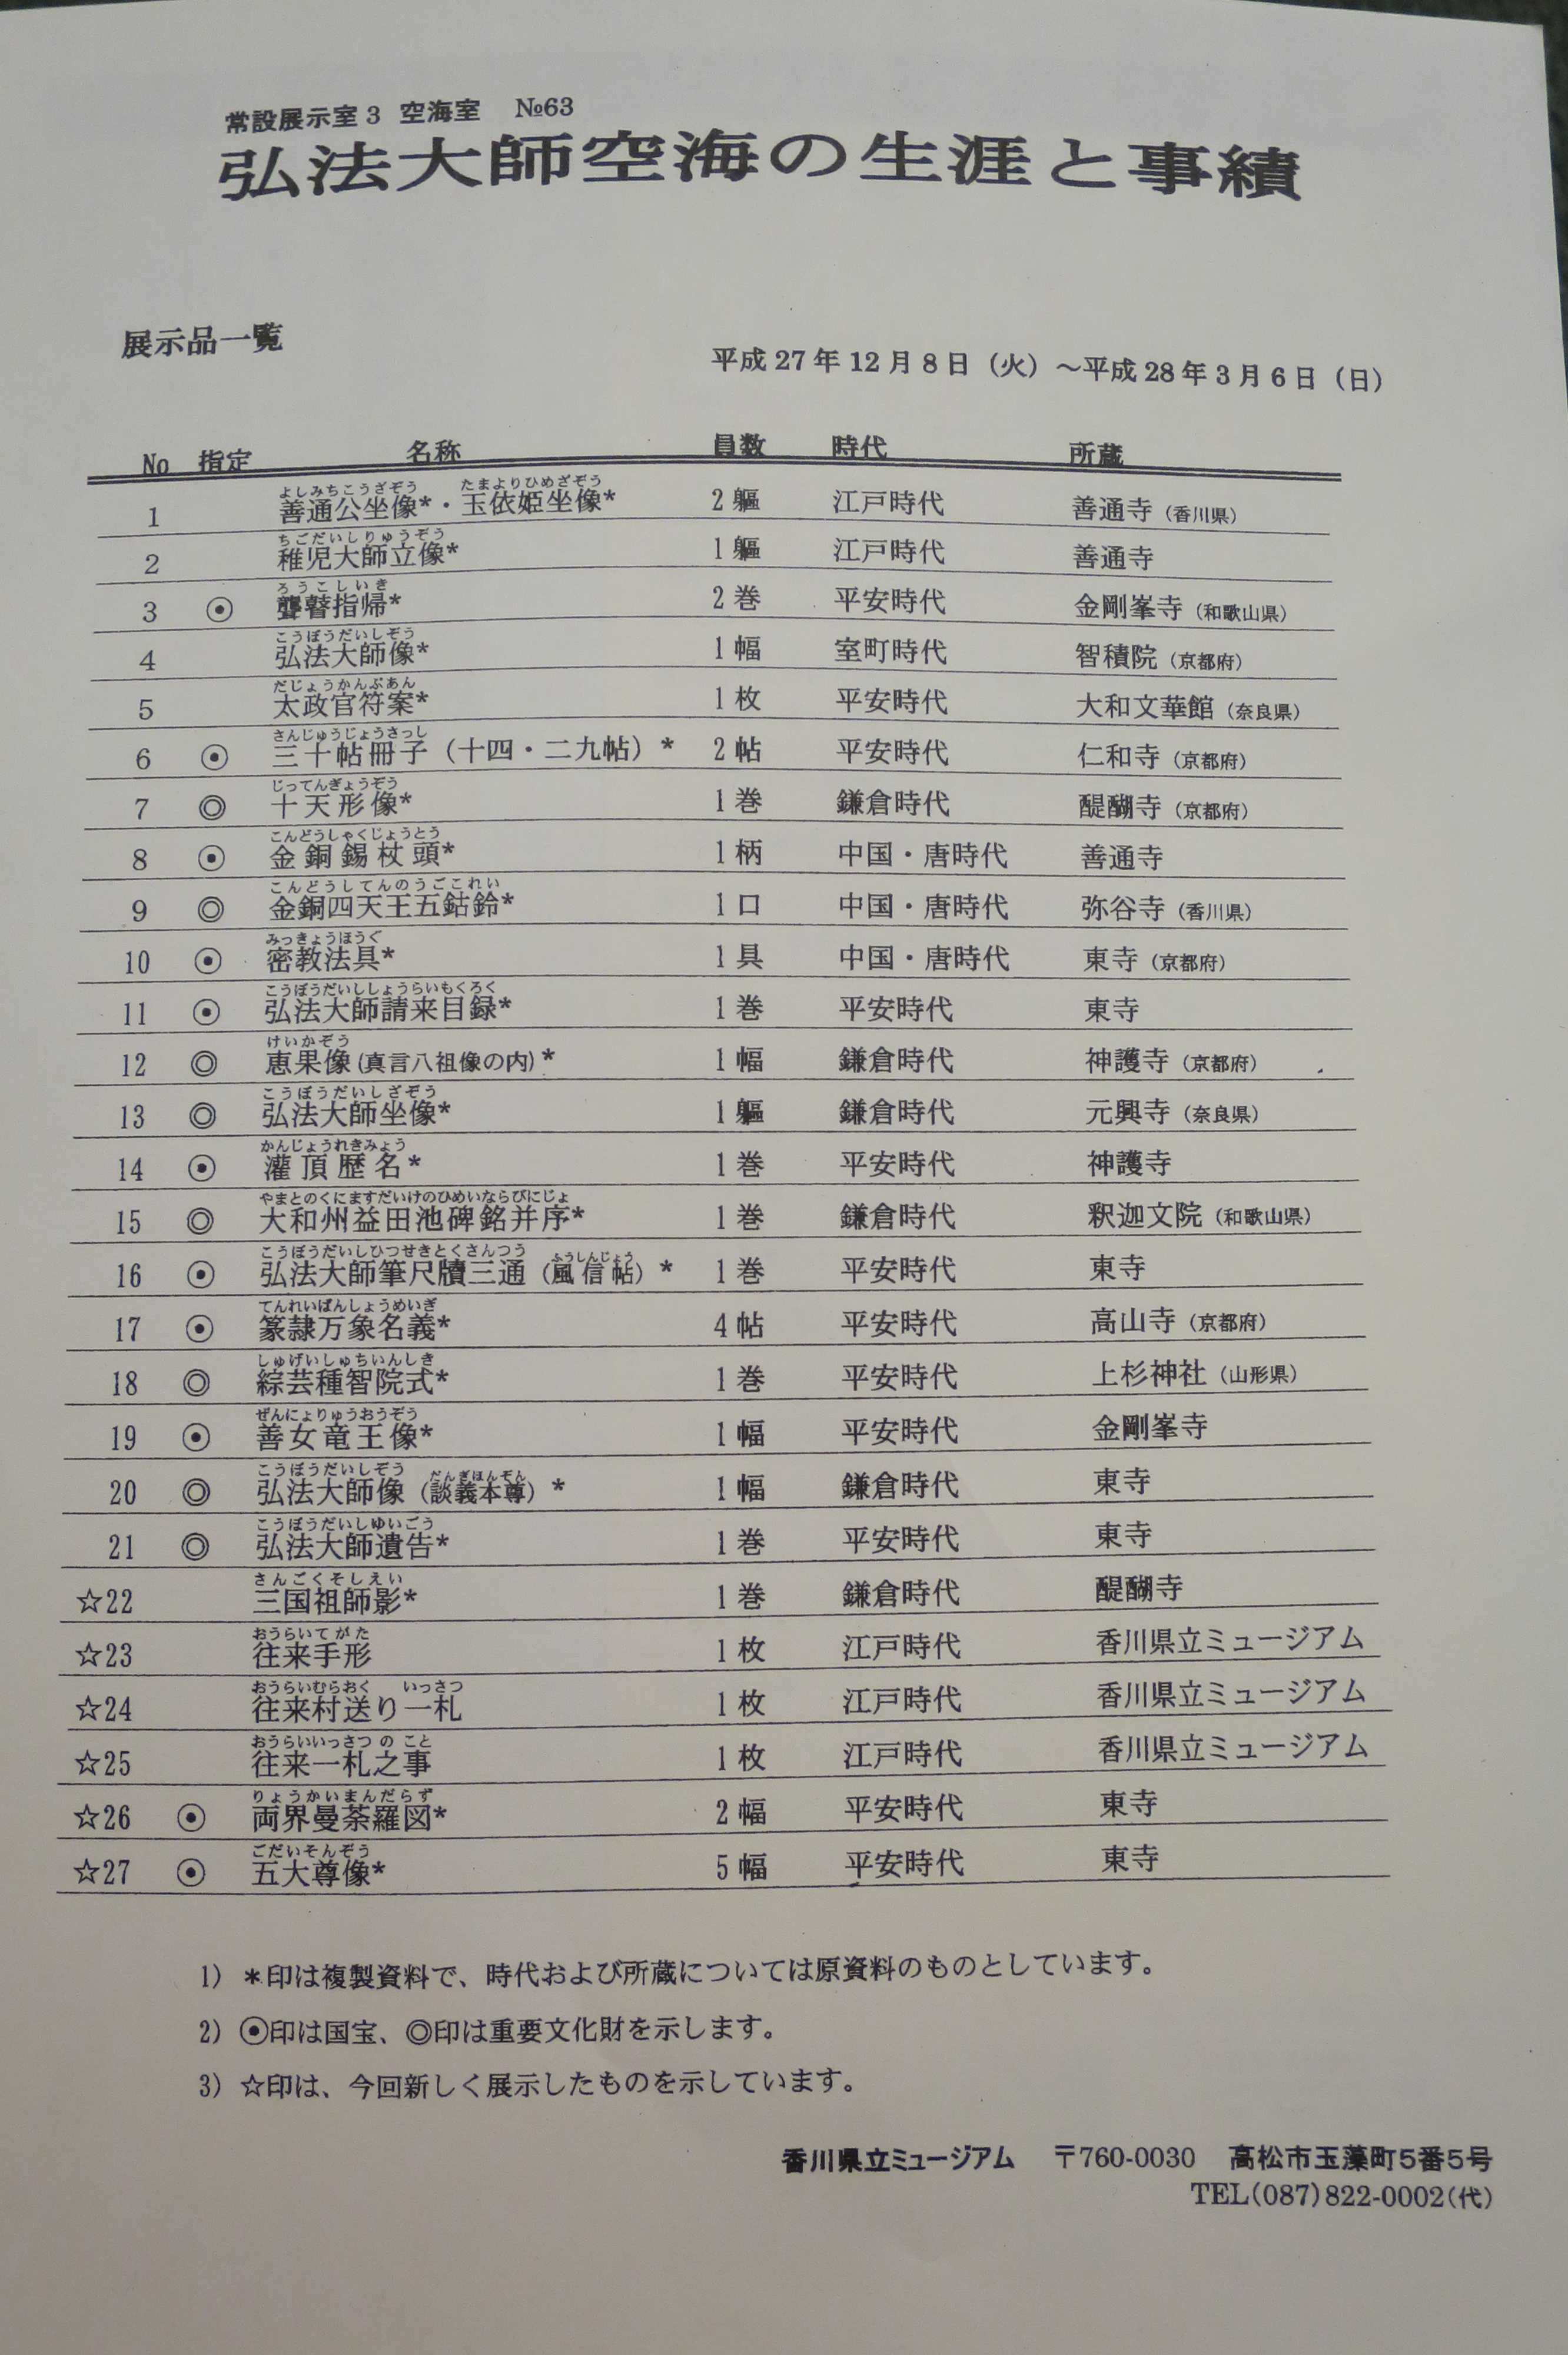 弘法大師空海の生涯と事績 展示品一覧